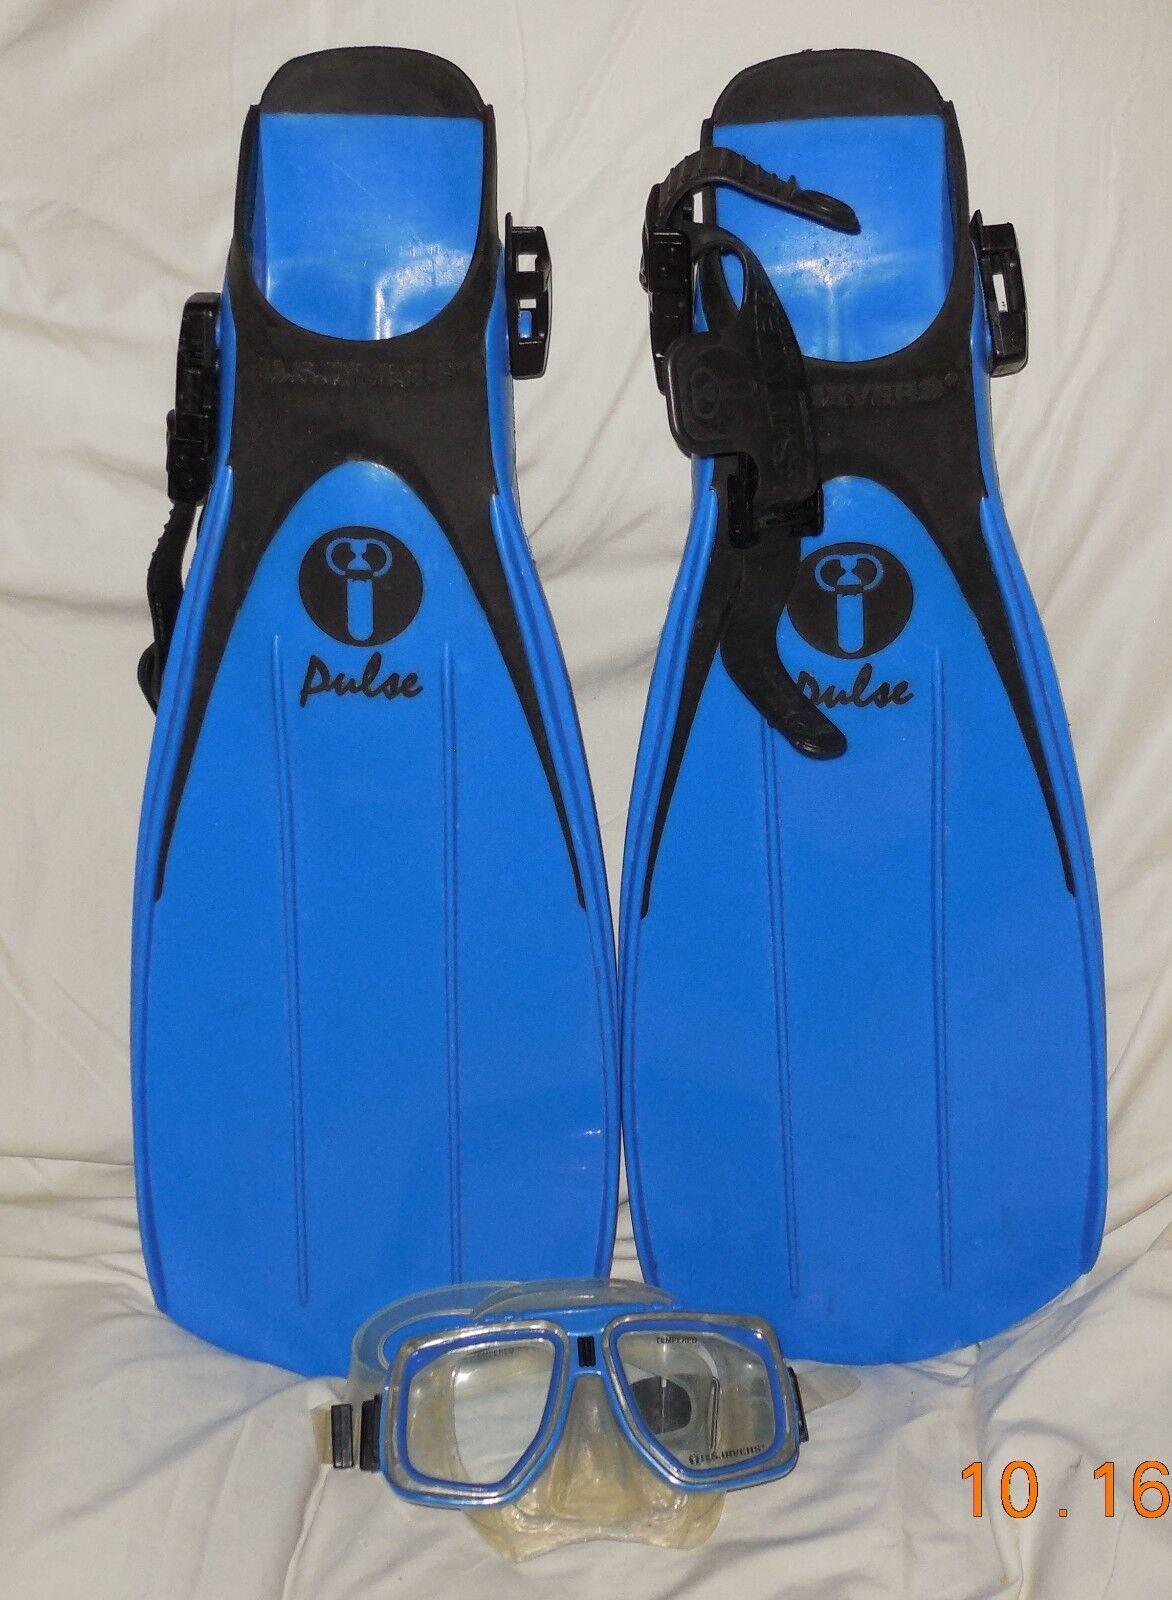 U.S. Divers Deep Sea Pulse  Scuba Diving Fins Size Small Men's 7 Women's 9 + Mask  considerate service